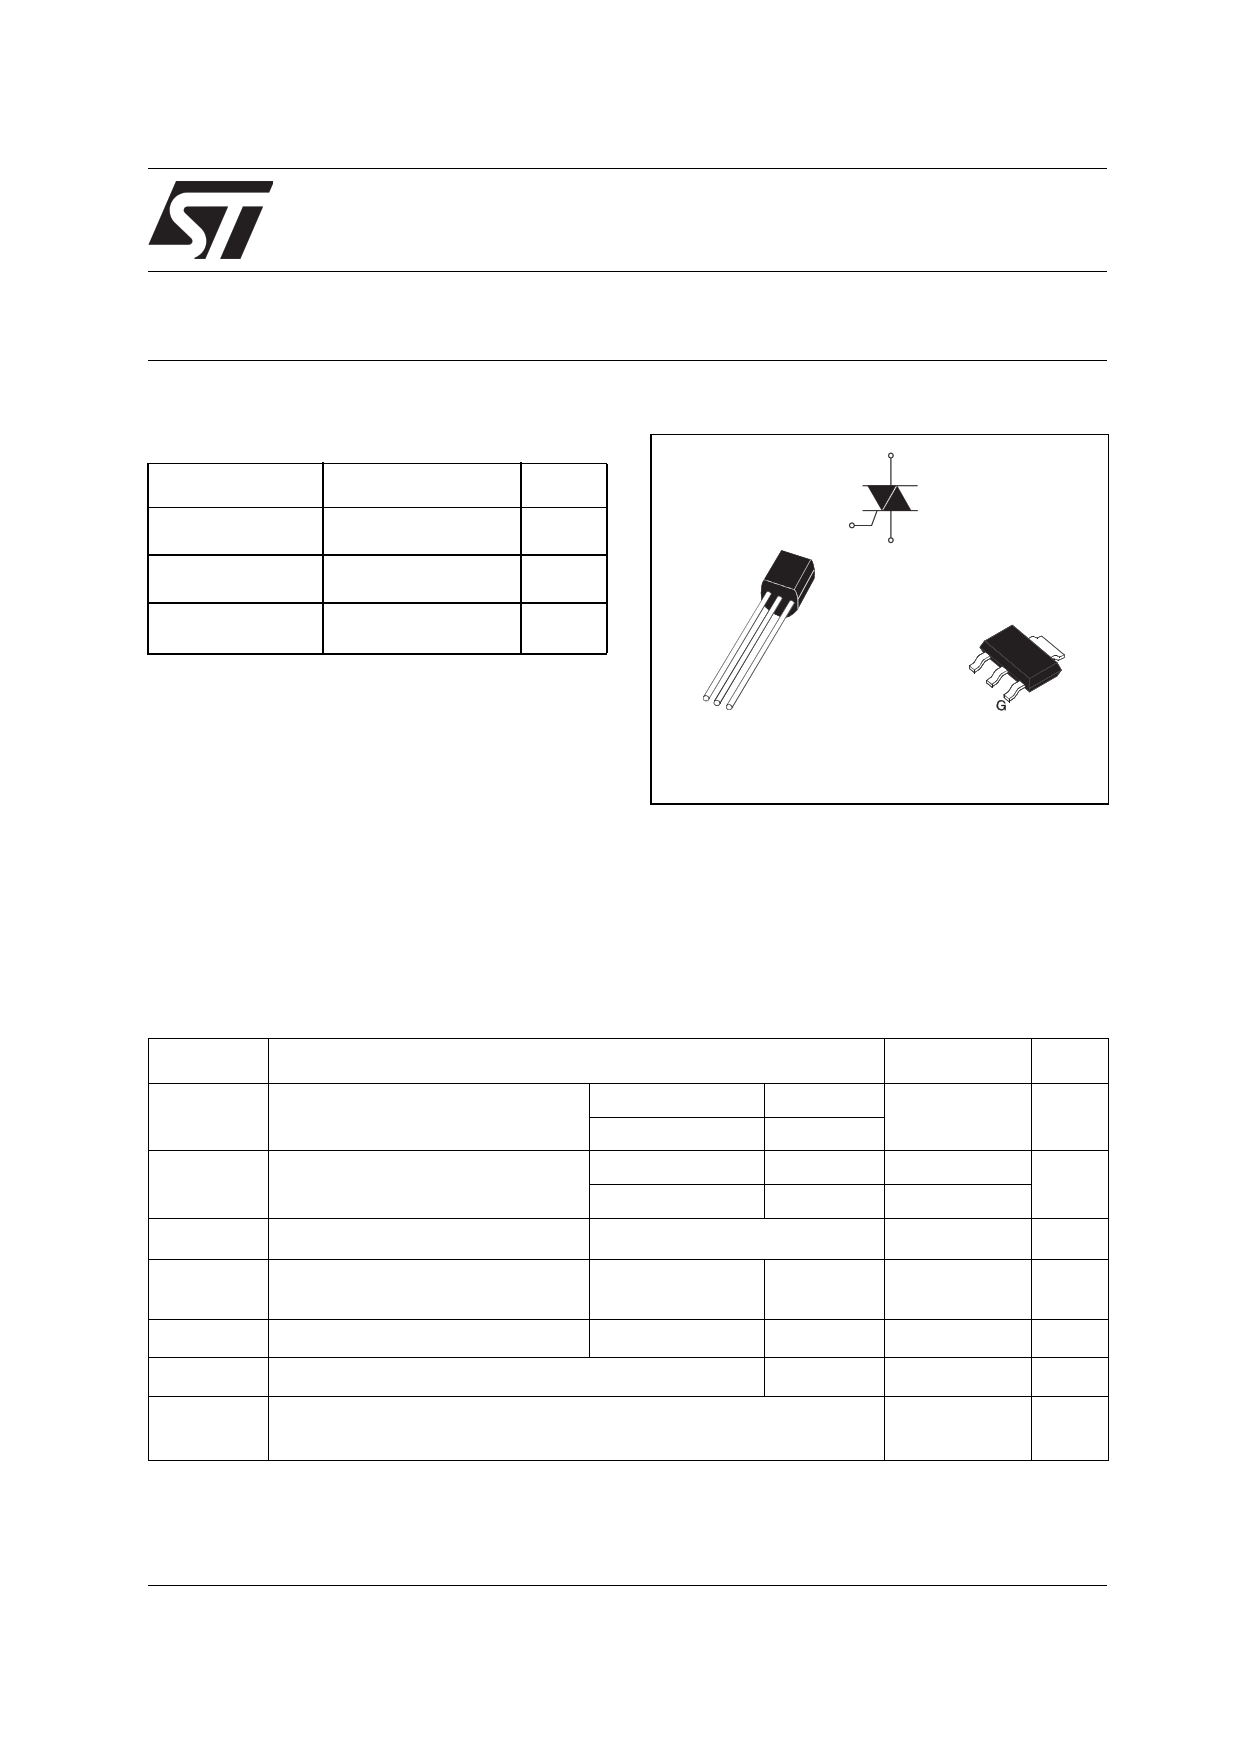 Z01 datasheet